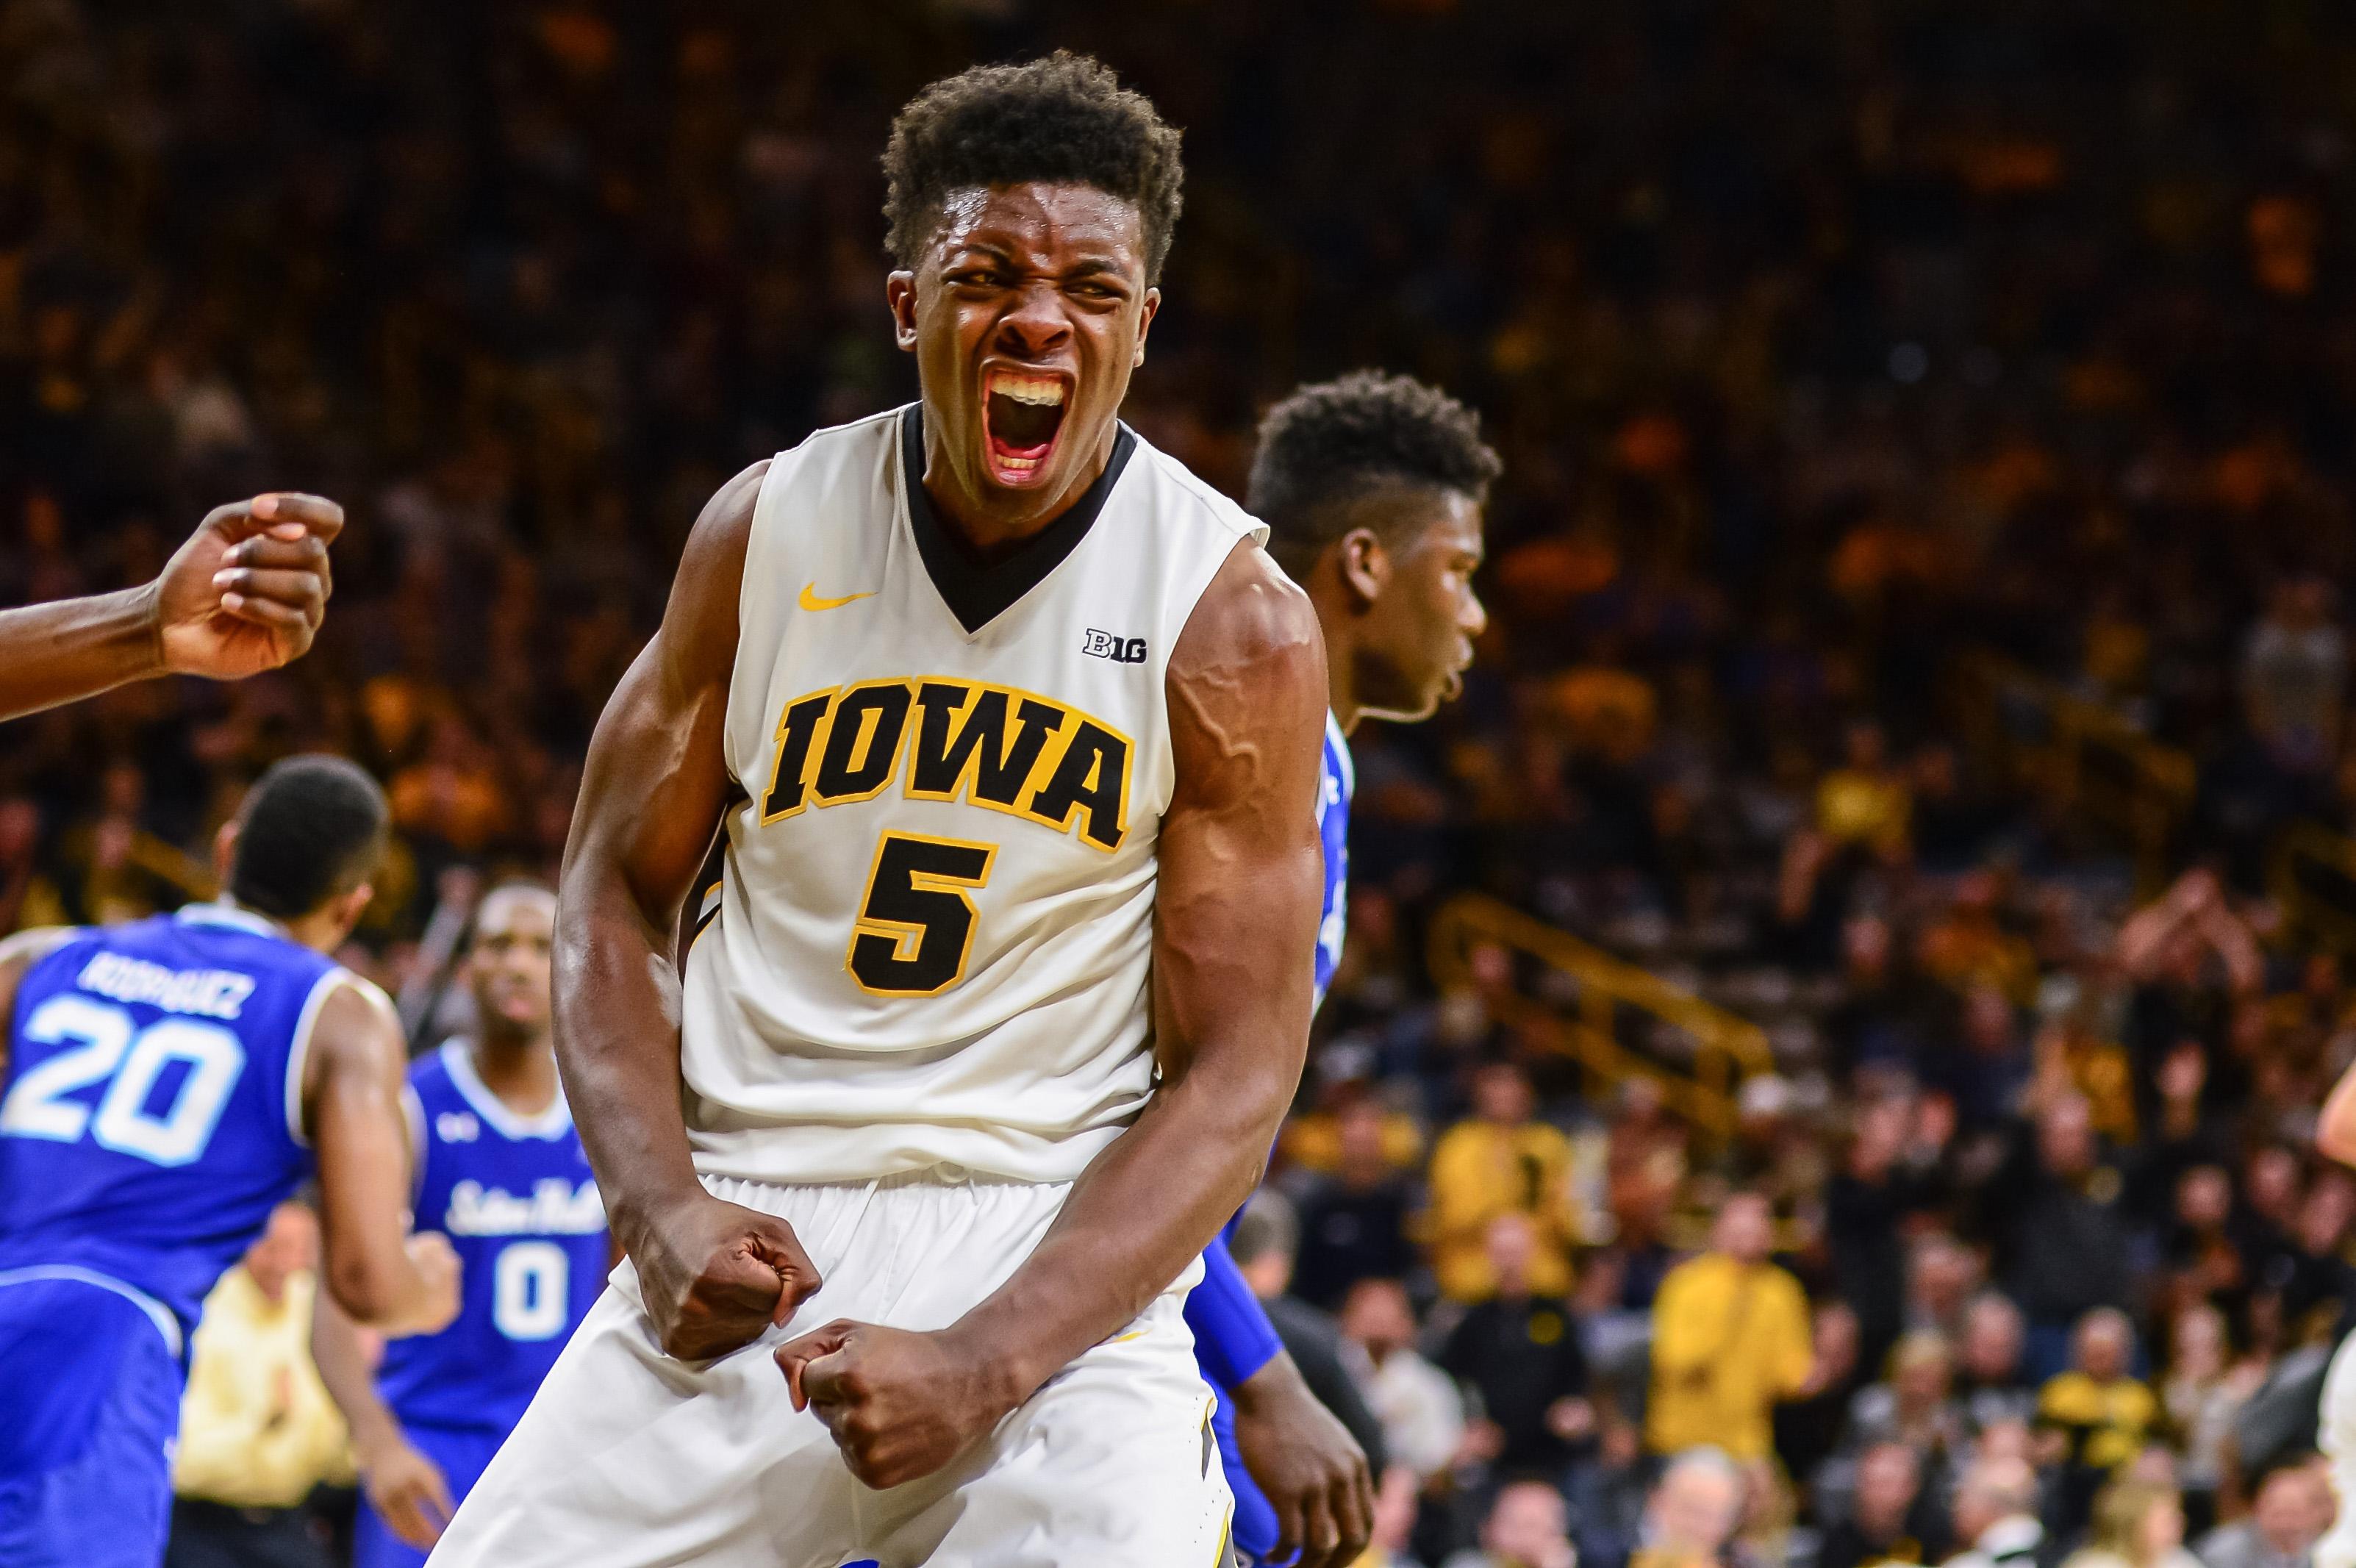 Notre Dame to face biggest test so far vs Iowa